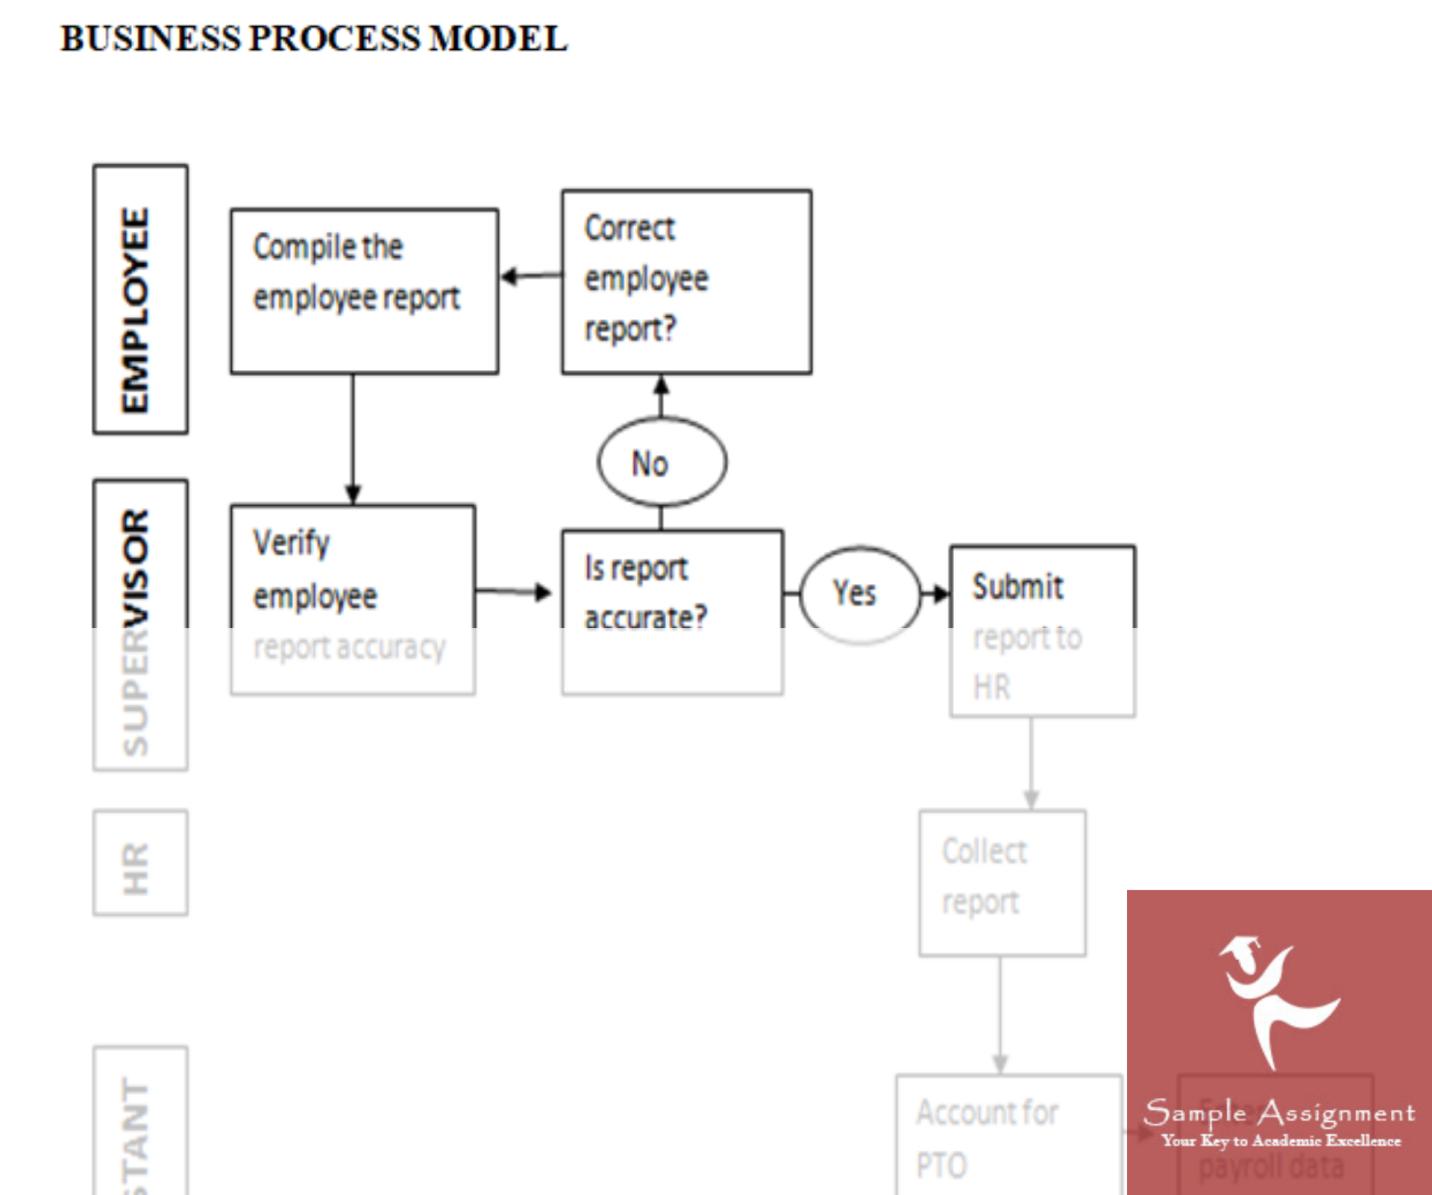 Business Process Model